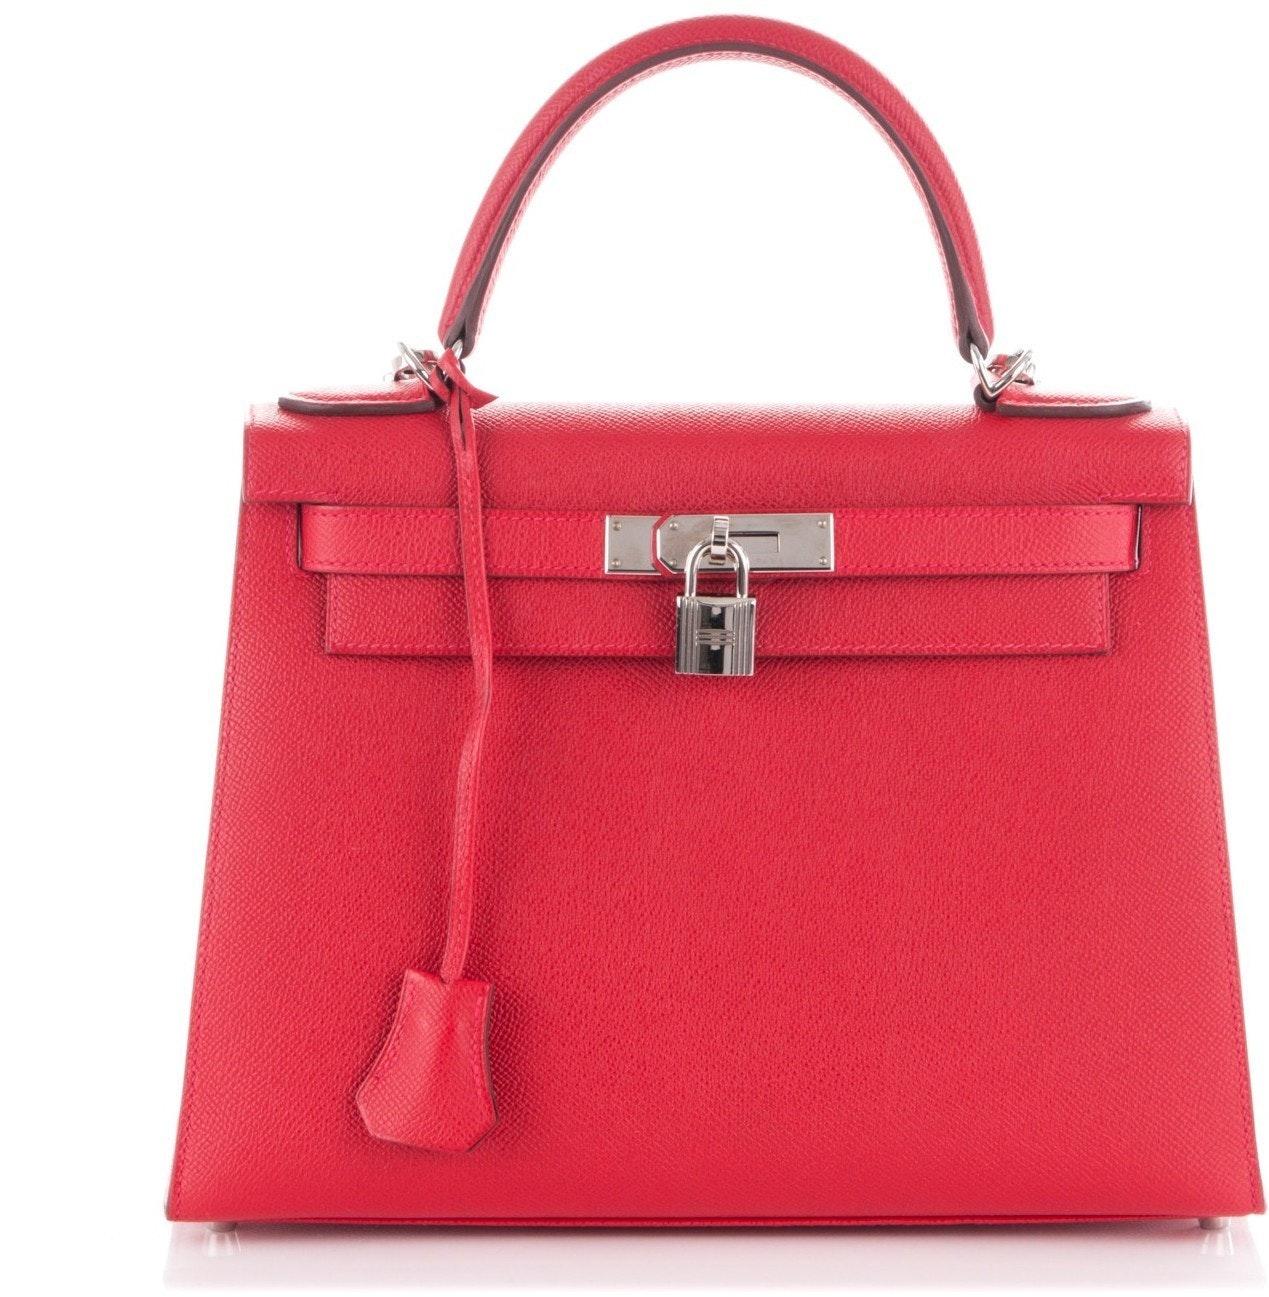 Hermes Kelly Sellier Epsom 28 Rouge Casaque